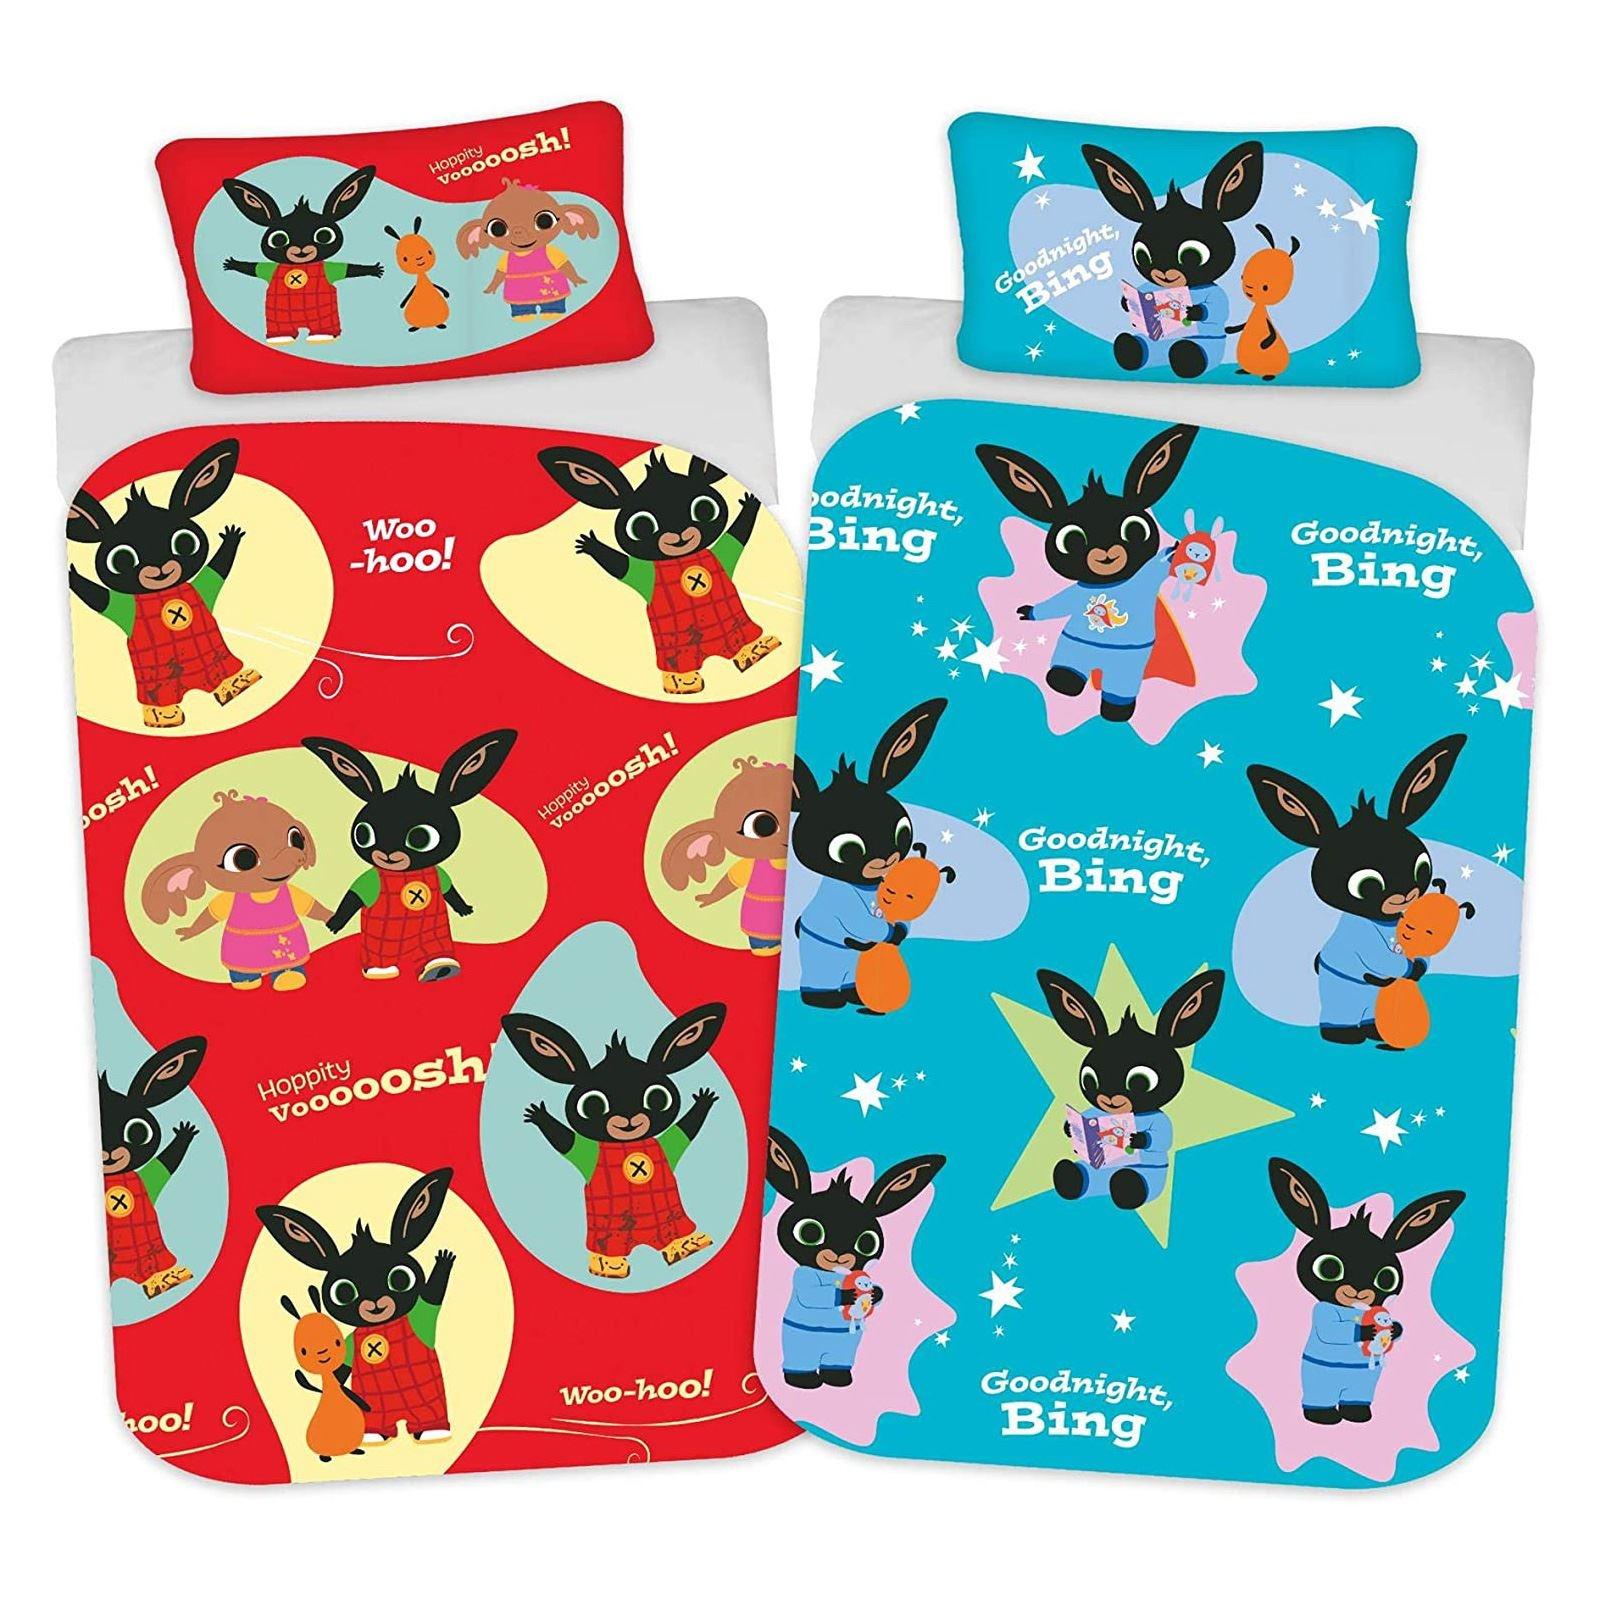 Bing Bunny Bing Bunny Duvet Cover Set Hoppity Voosh Whoosh